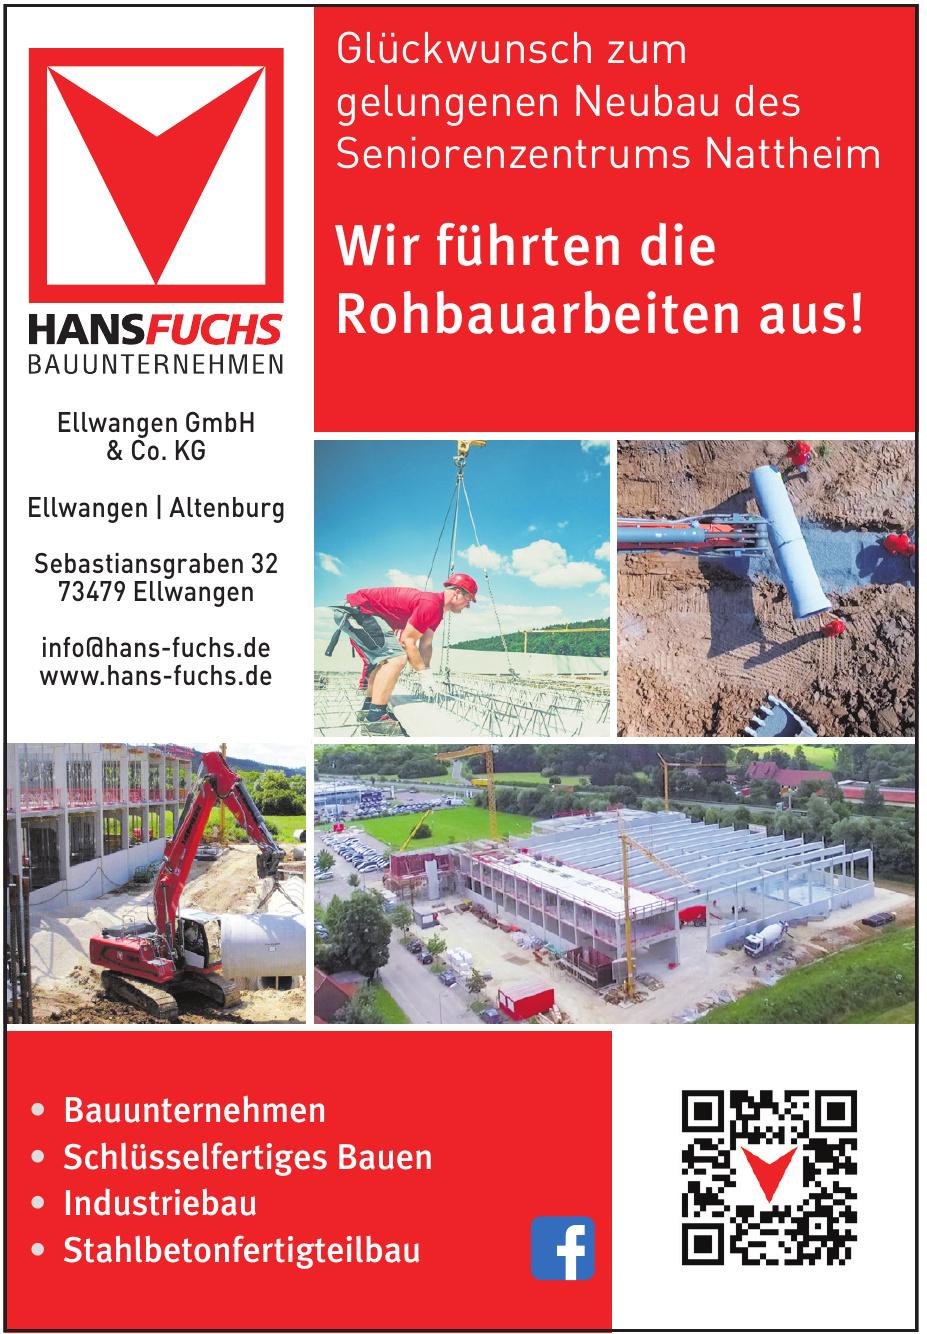 Hans Fuchs Bauunternehmen Ellwangen GmbH & Co. KG